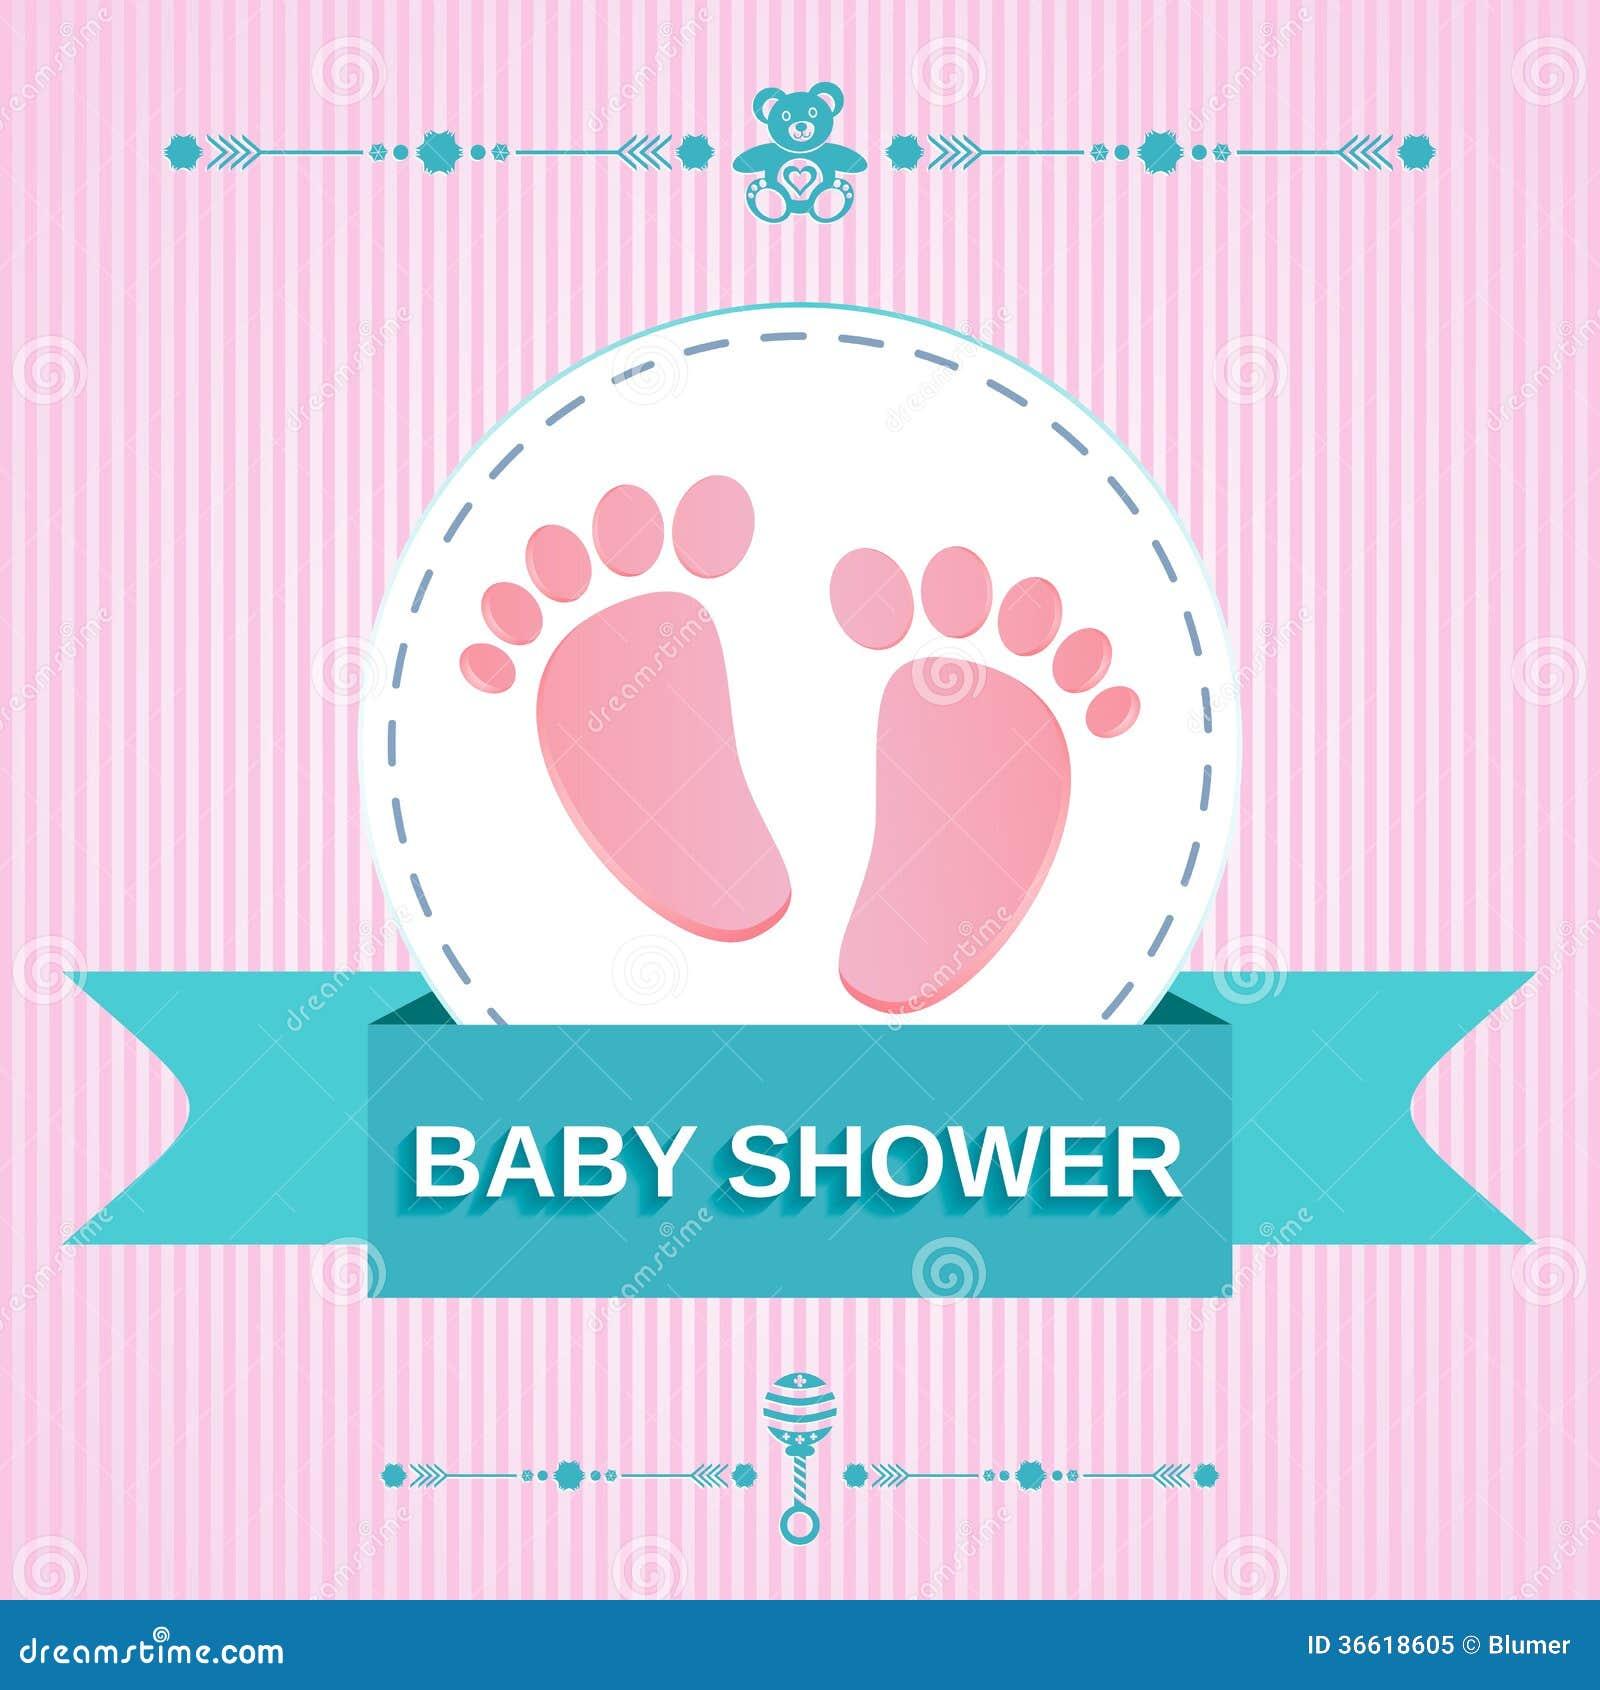 Baby shower design royalty free stock photo image 36618605 - Photo baby shower ...